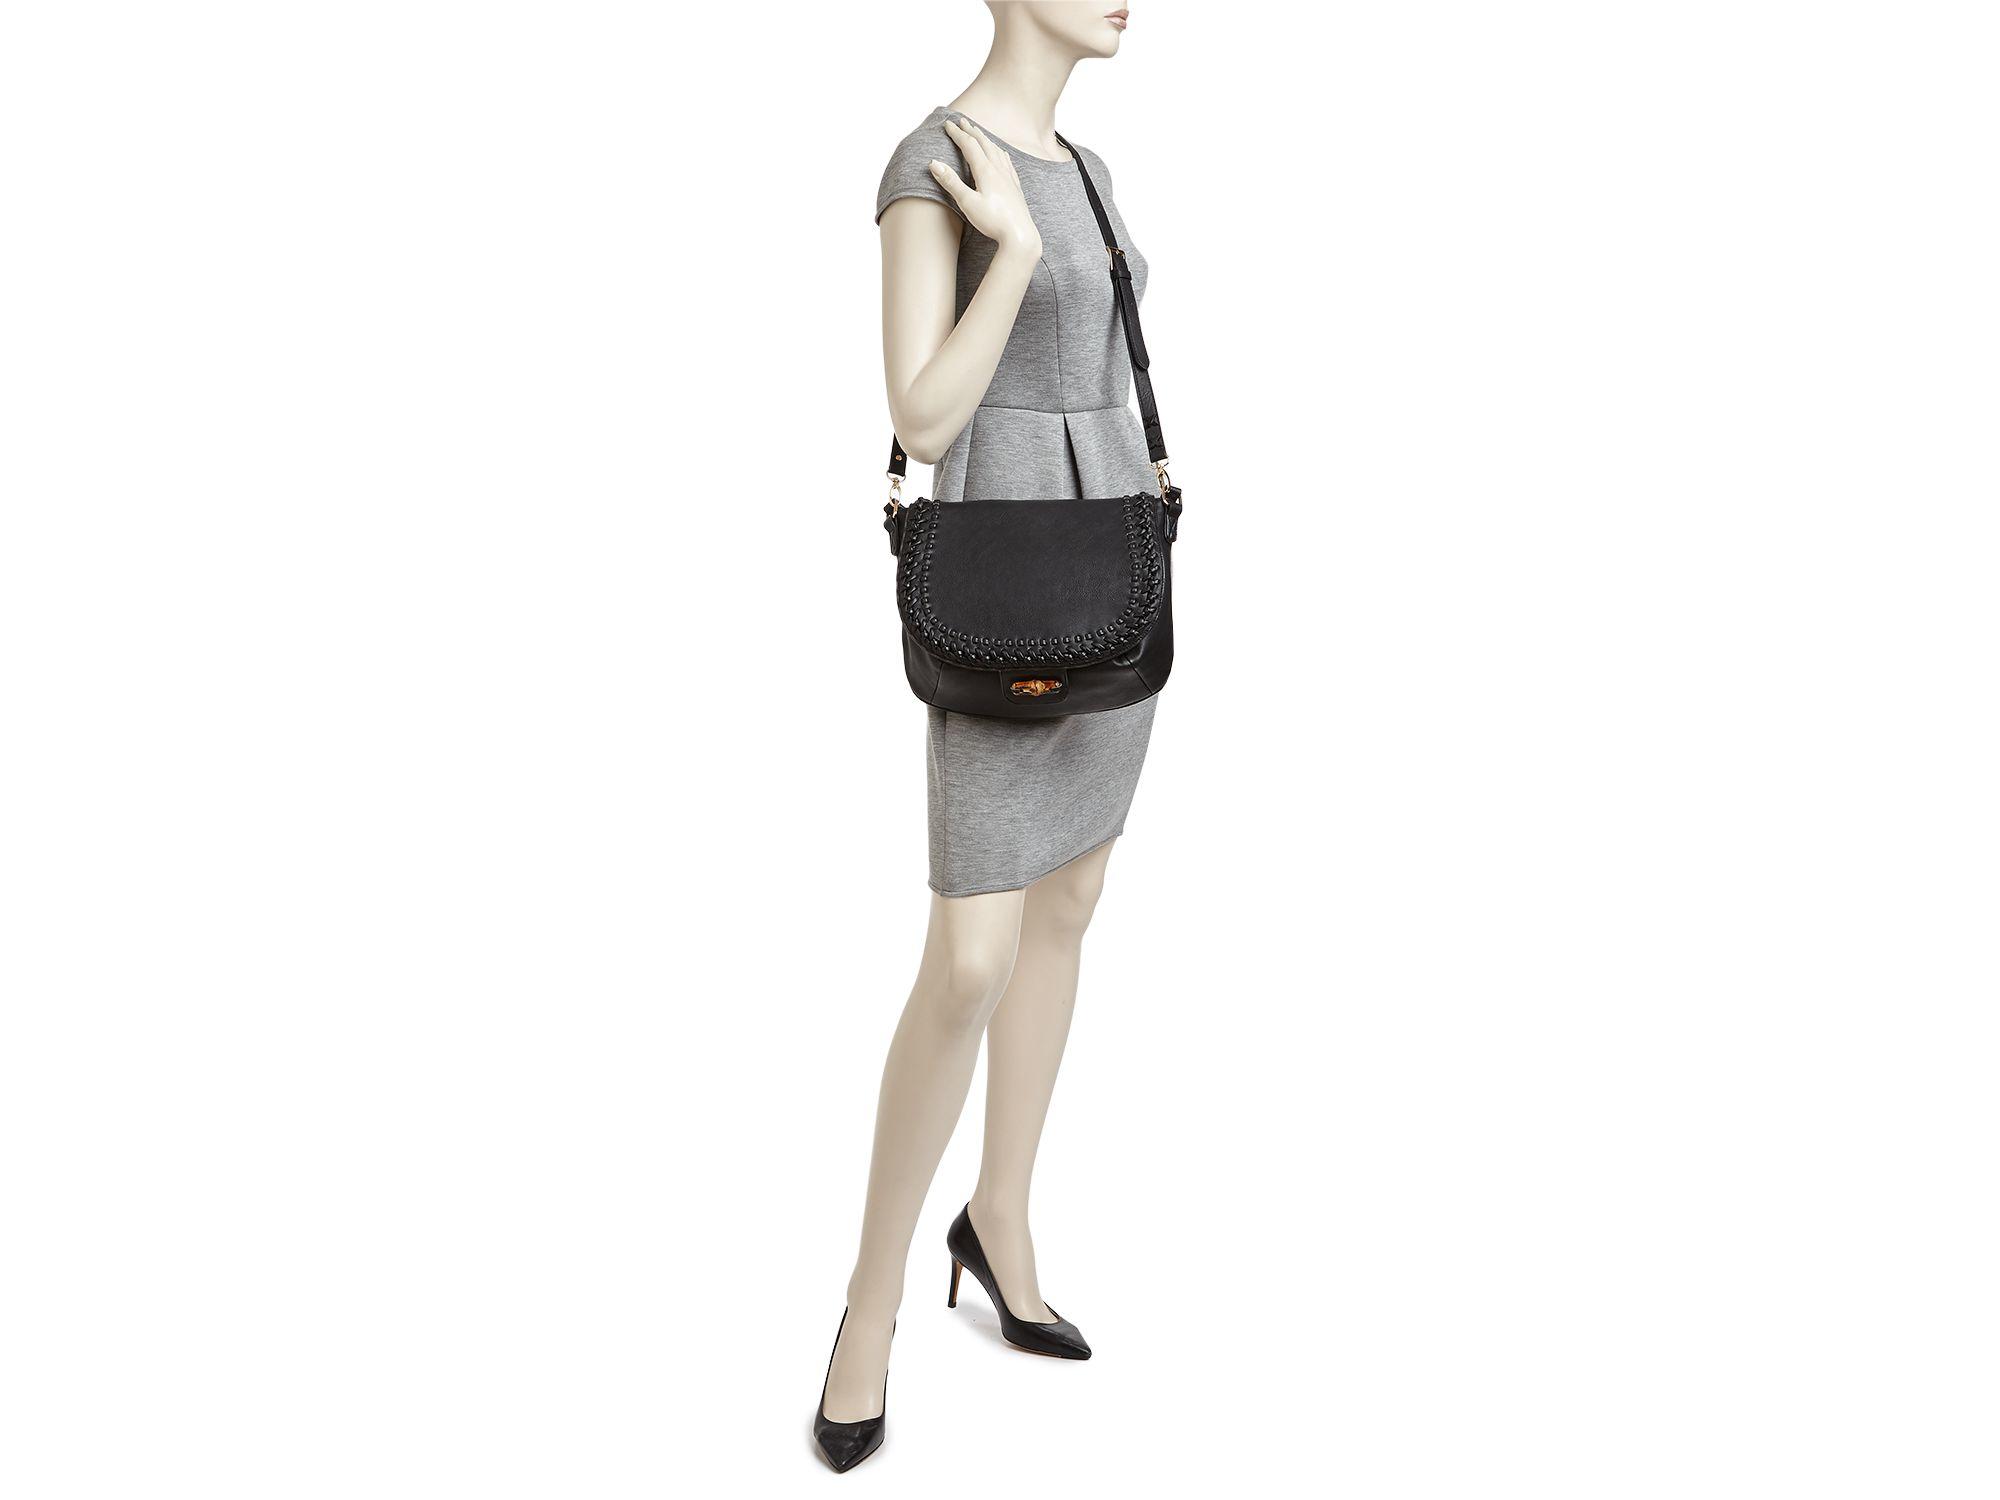 Big Buddha Hana Whipstitch Crossbody Messenger Bag - Compare At $80 in Black